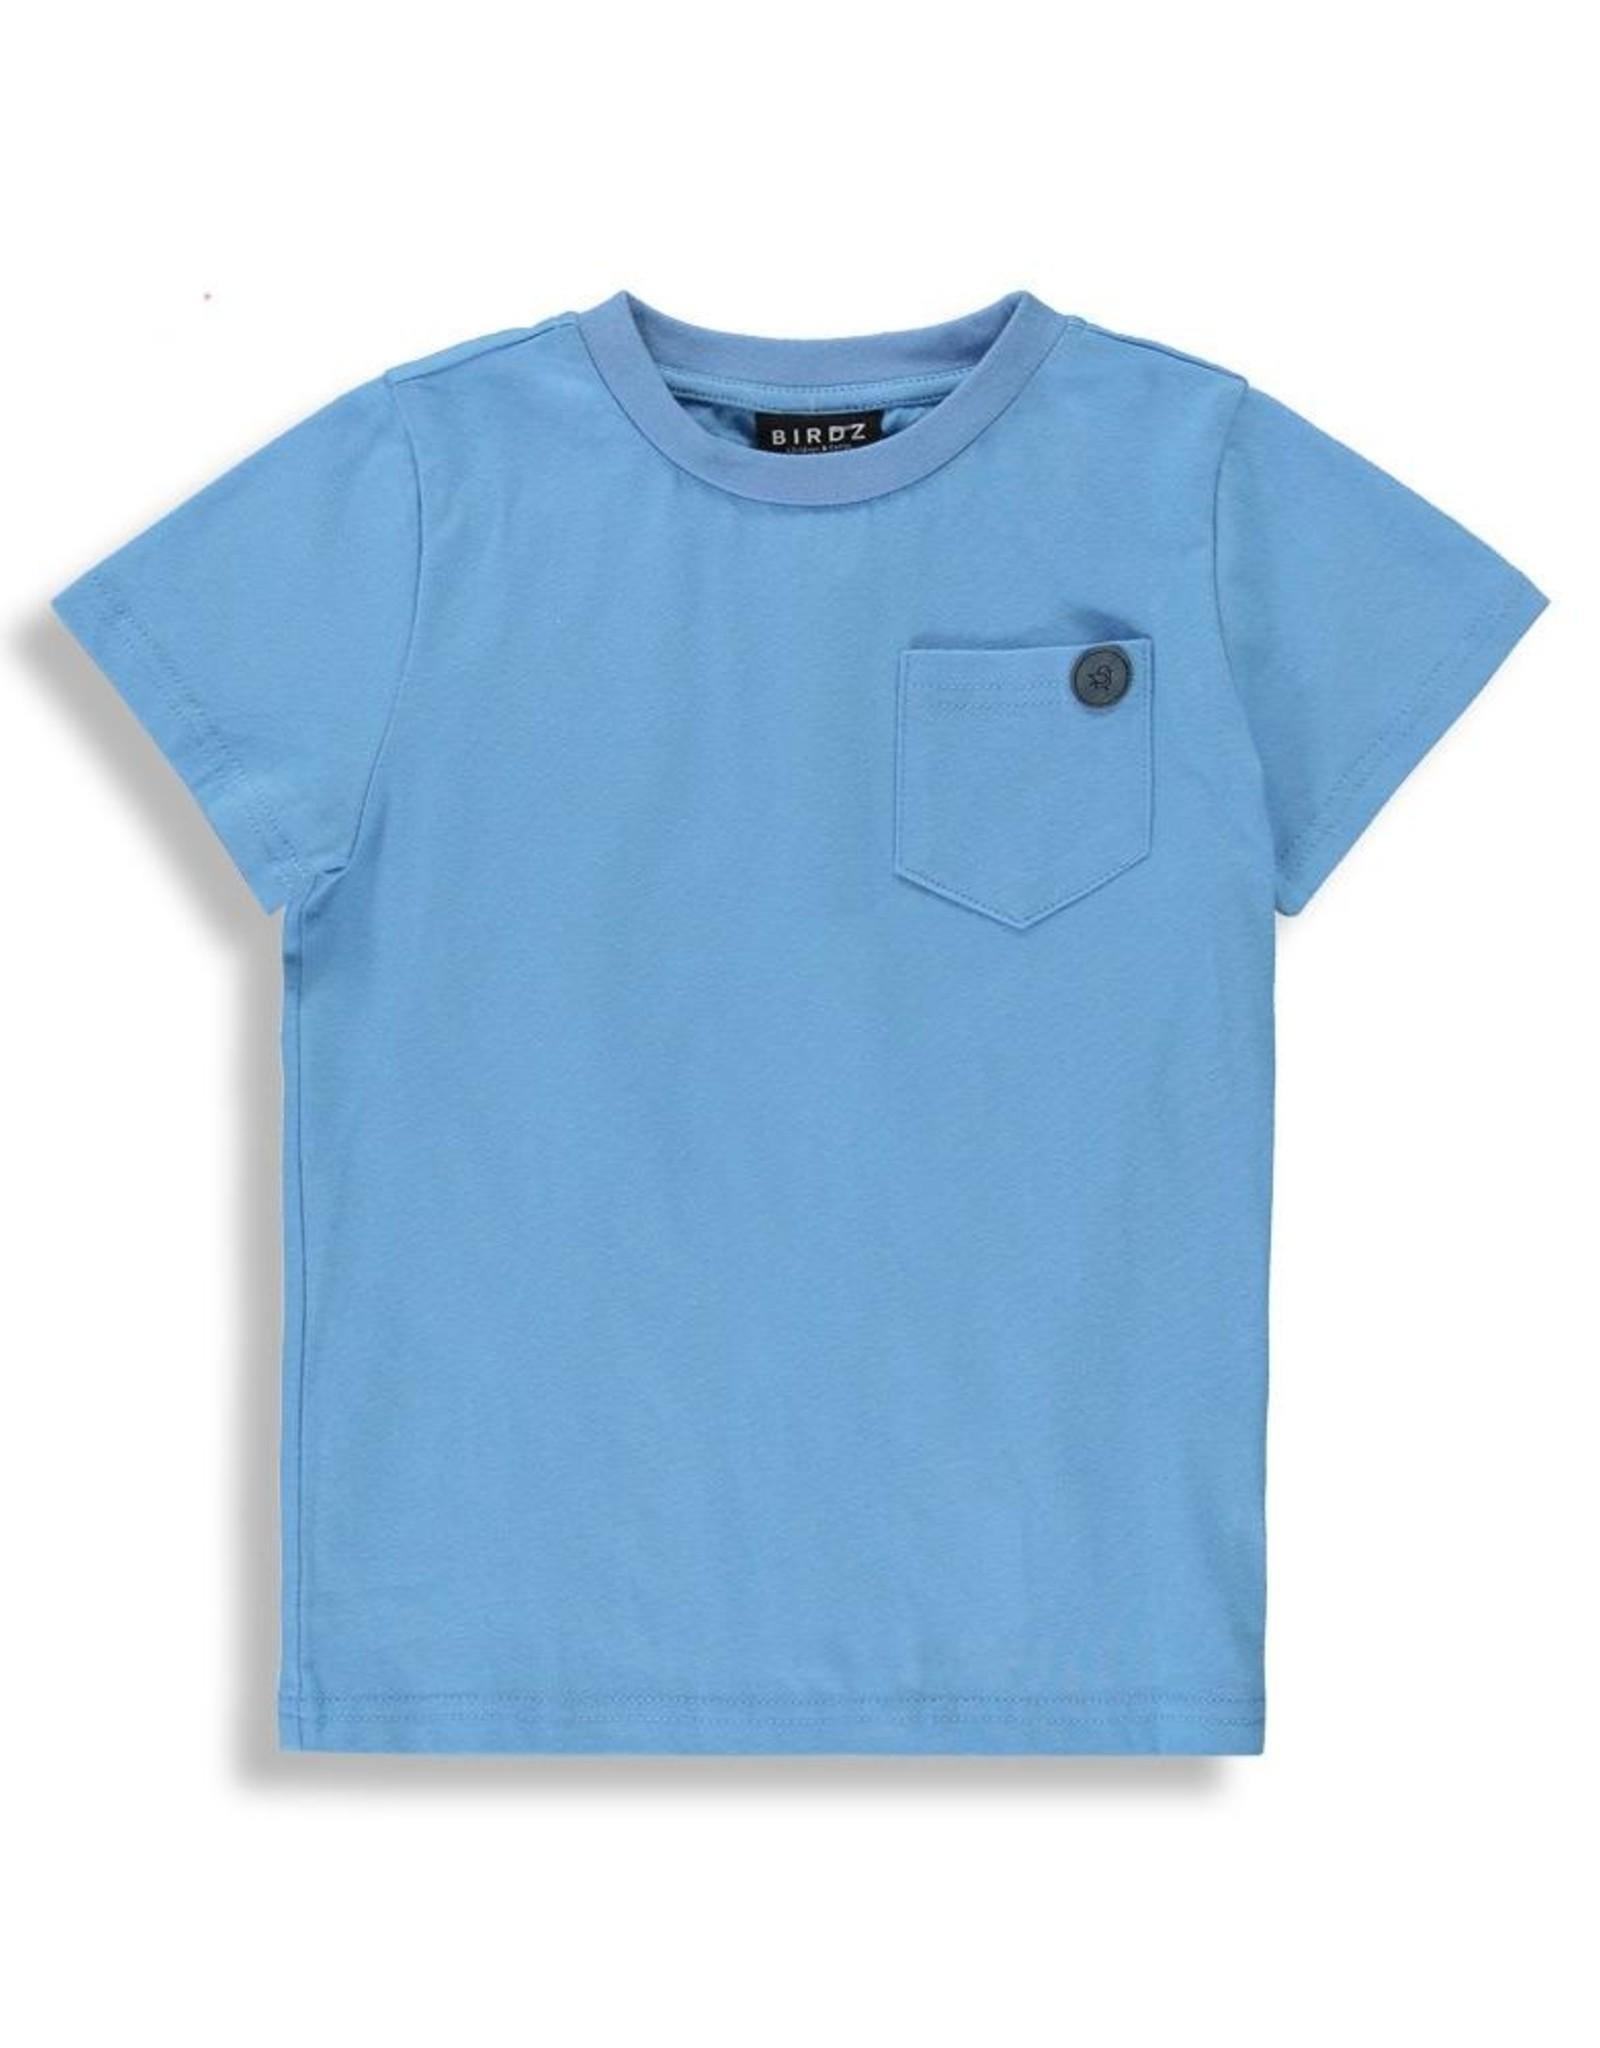 Birdz Basic T w/pocket - Blue or Black